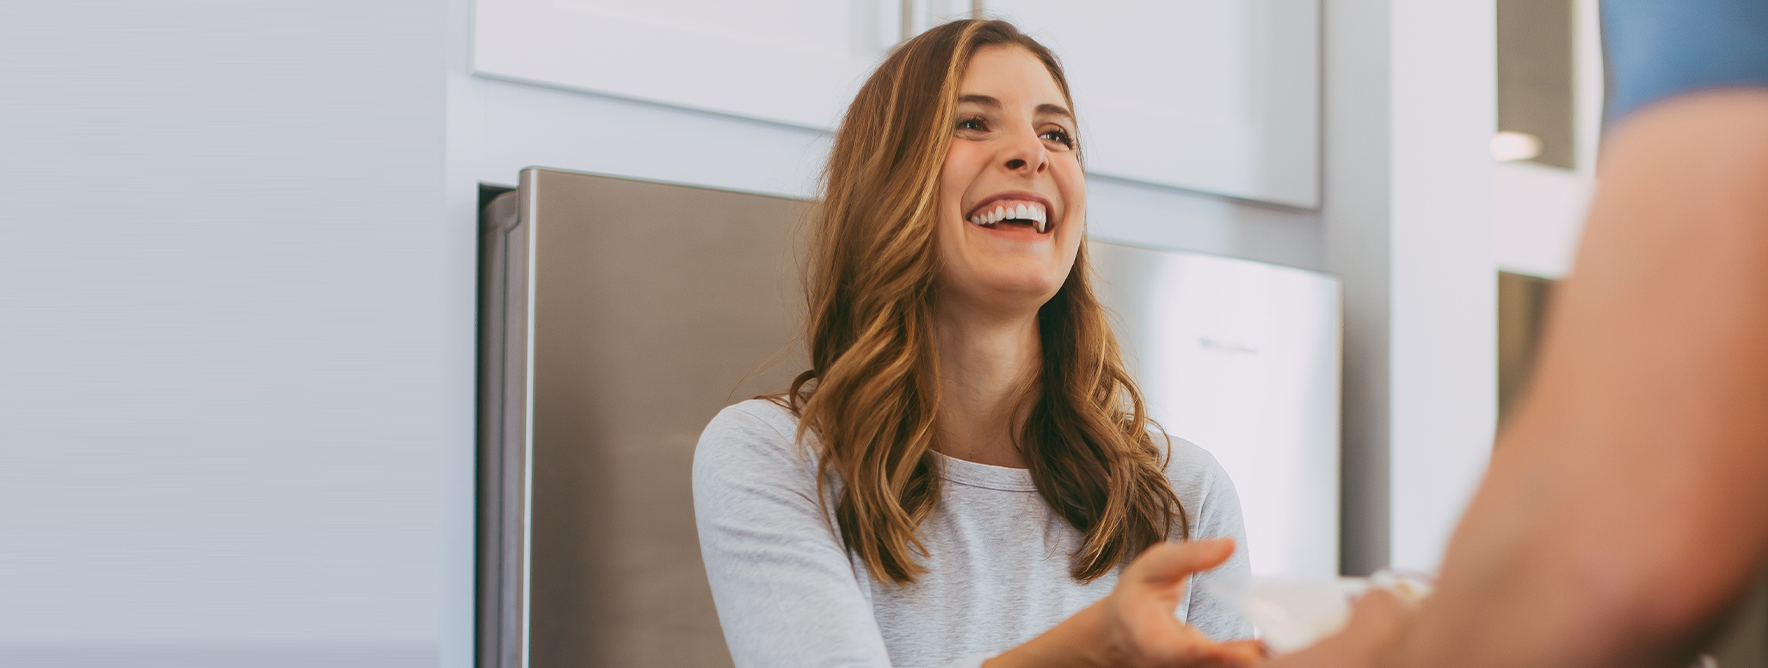 Charlotte Haynie - health - tasc performance - nutrition